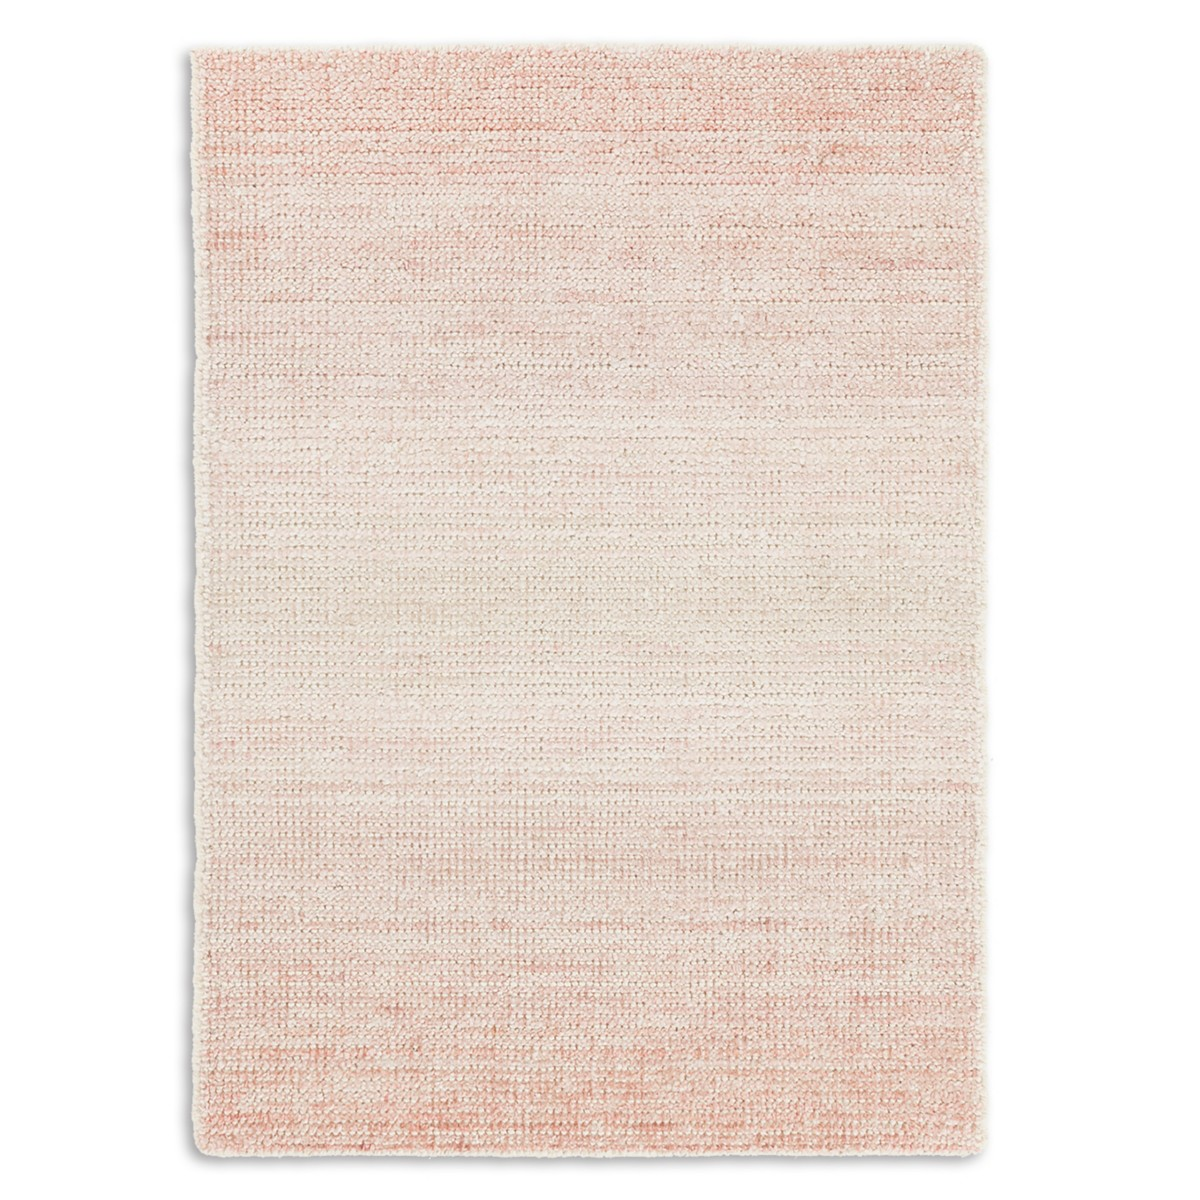 Moon Cotton Viscose Woven Rug - Pink